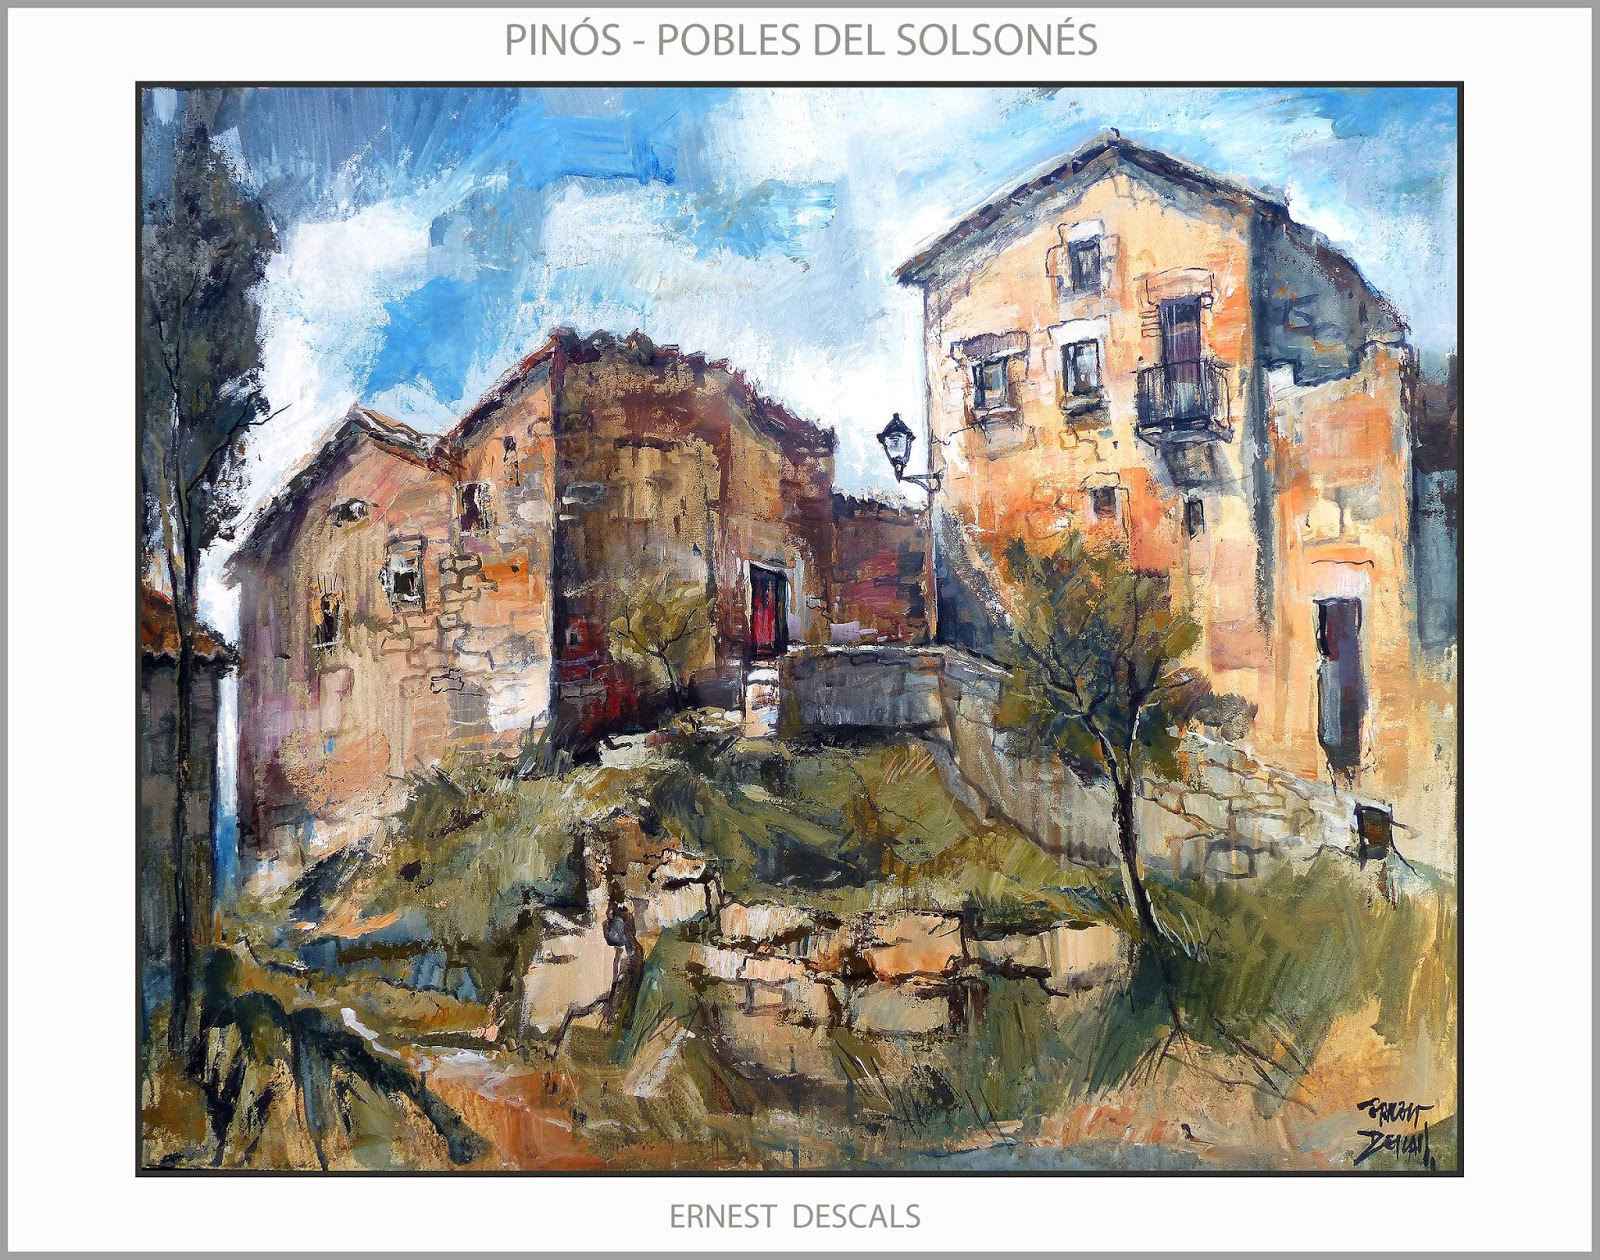 Ernest descals artista pintor pin s pintura paisatges - Pintores en lleida ...